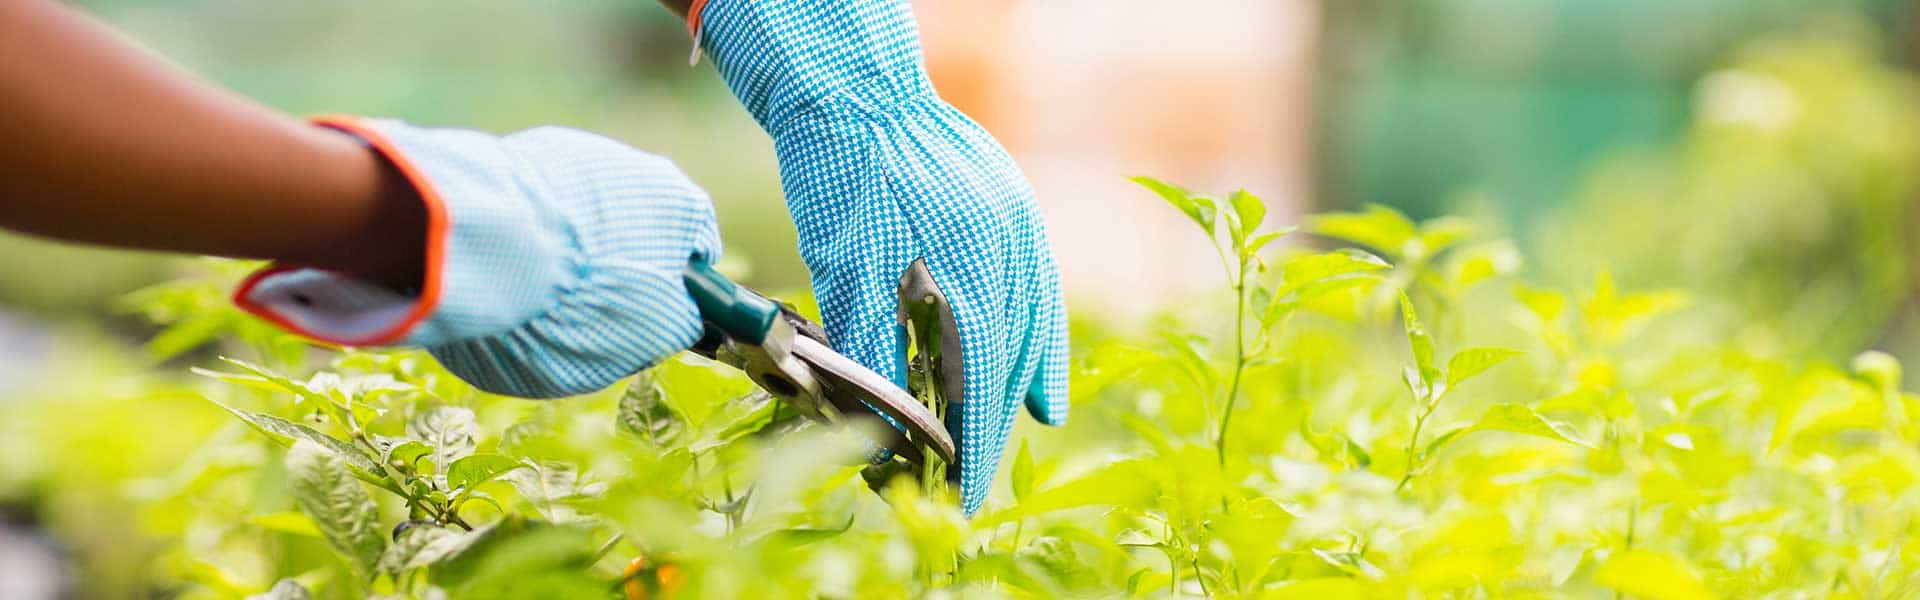 Let us transform your garden into the place you deserve!